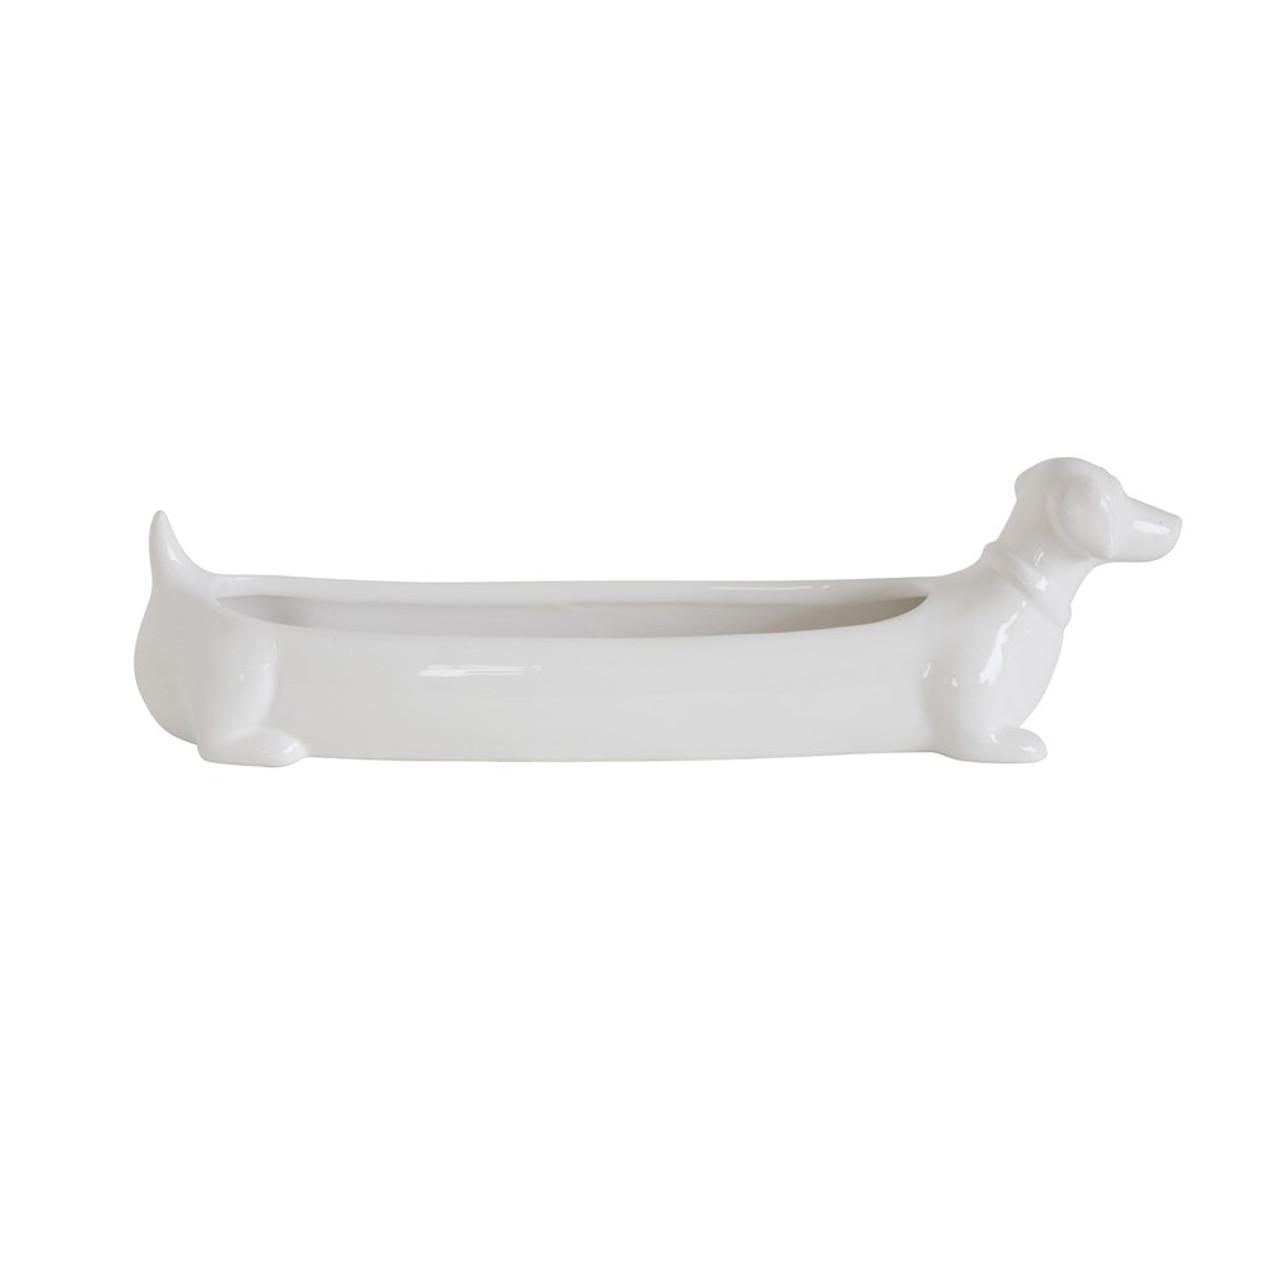 White Ceramic Dachshund Cracker Dish.